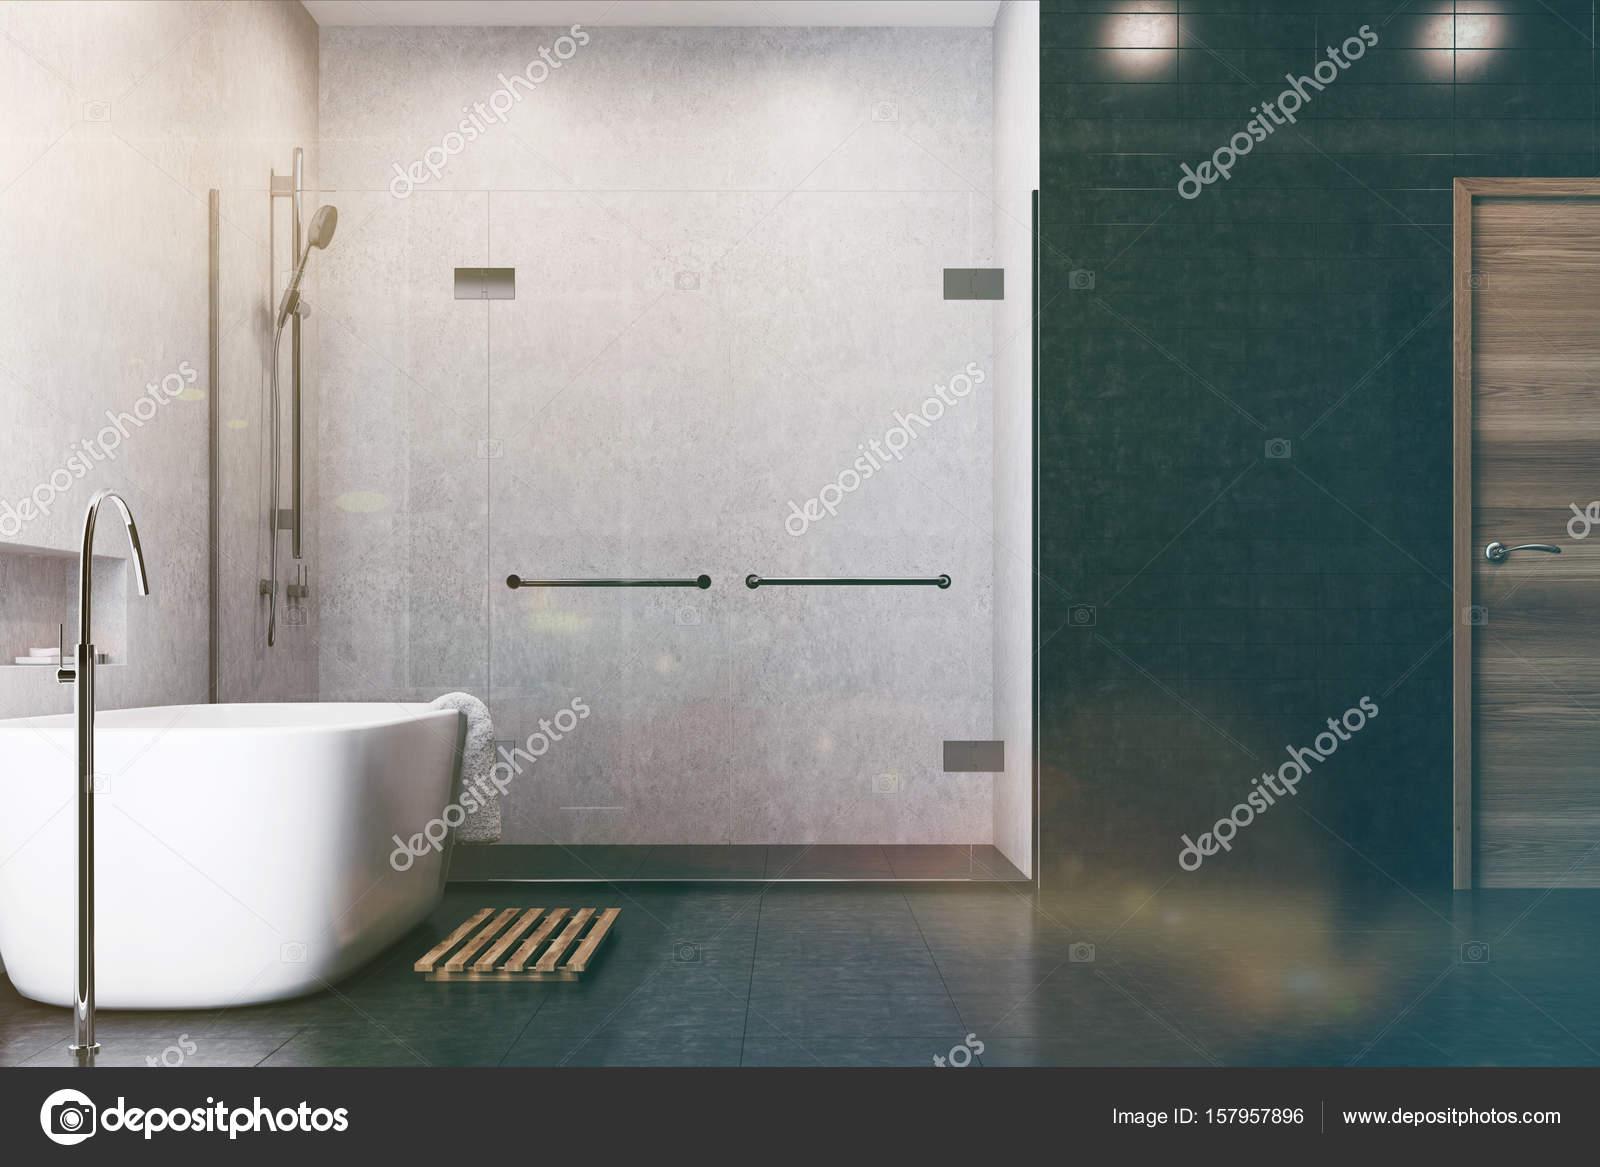 Zwarte Tegels Badkamer : Witte badkamer zwarte tegels douchezijde toned u stockfoto